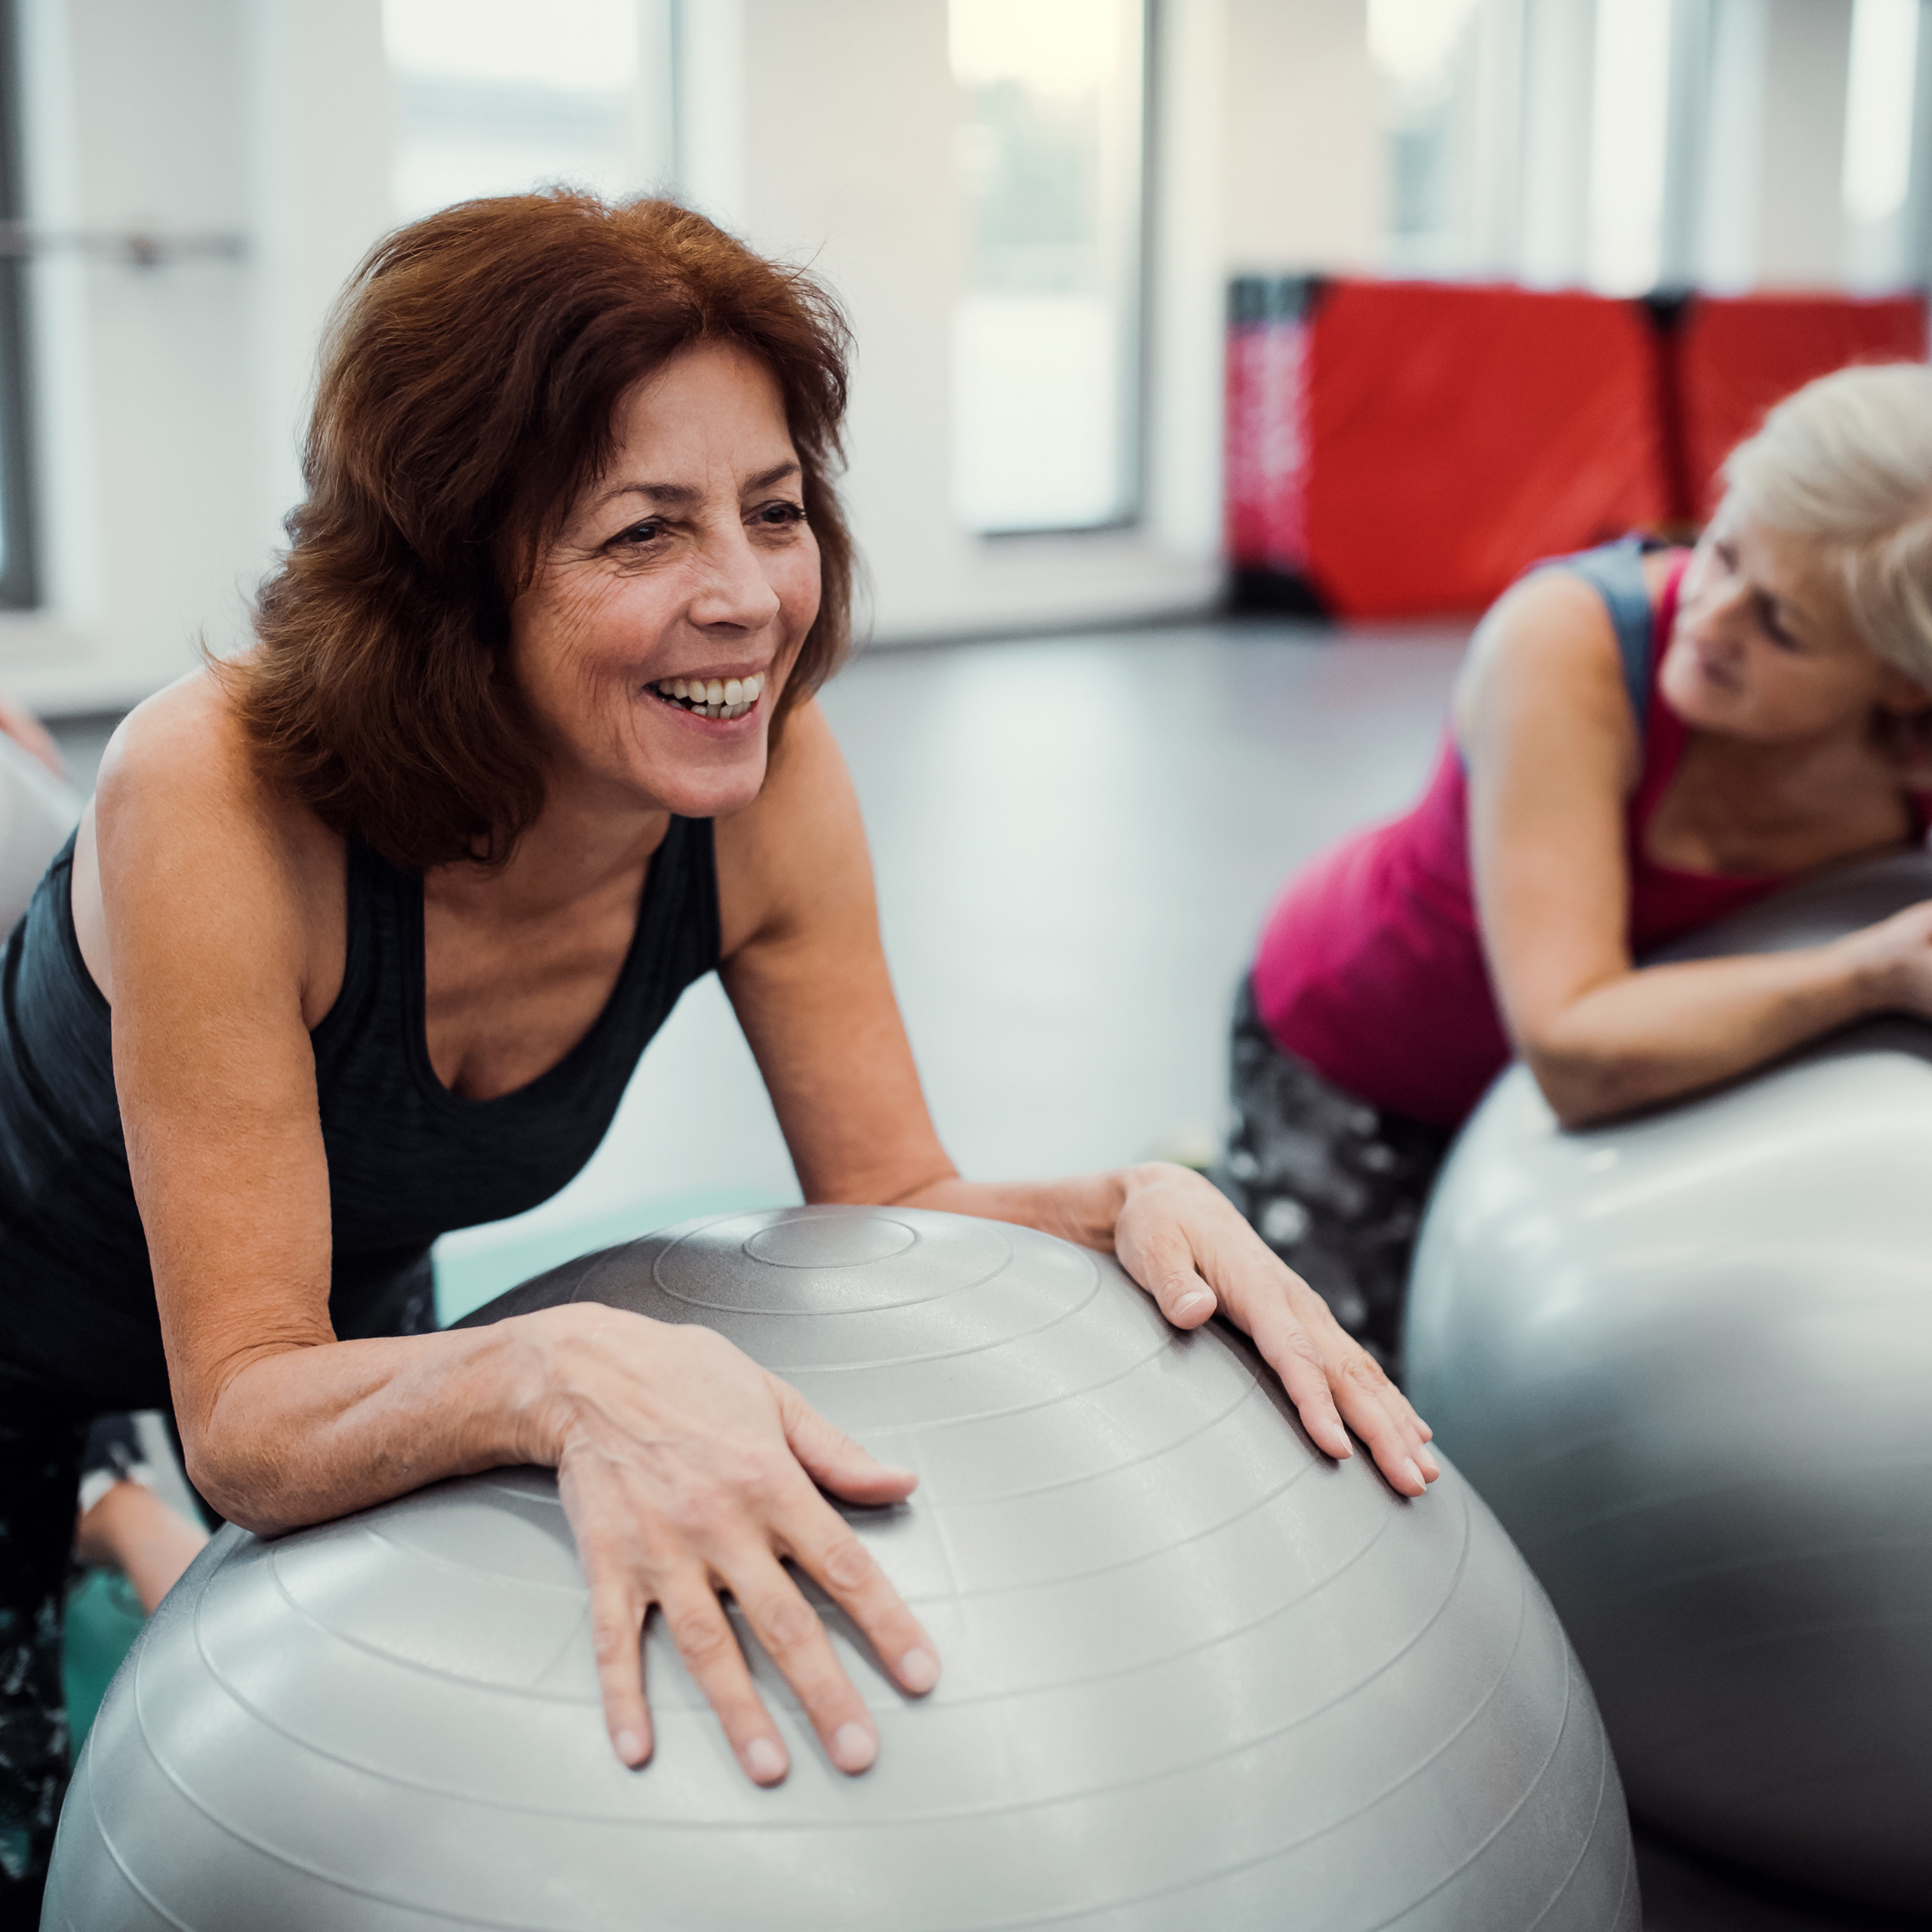 Exercise-Ball-75-cm-PVC-Yoga-Ball-Office-Seat-Gym-Ball-Pilates thumbnail 23